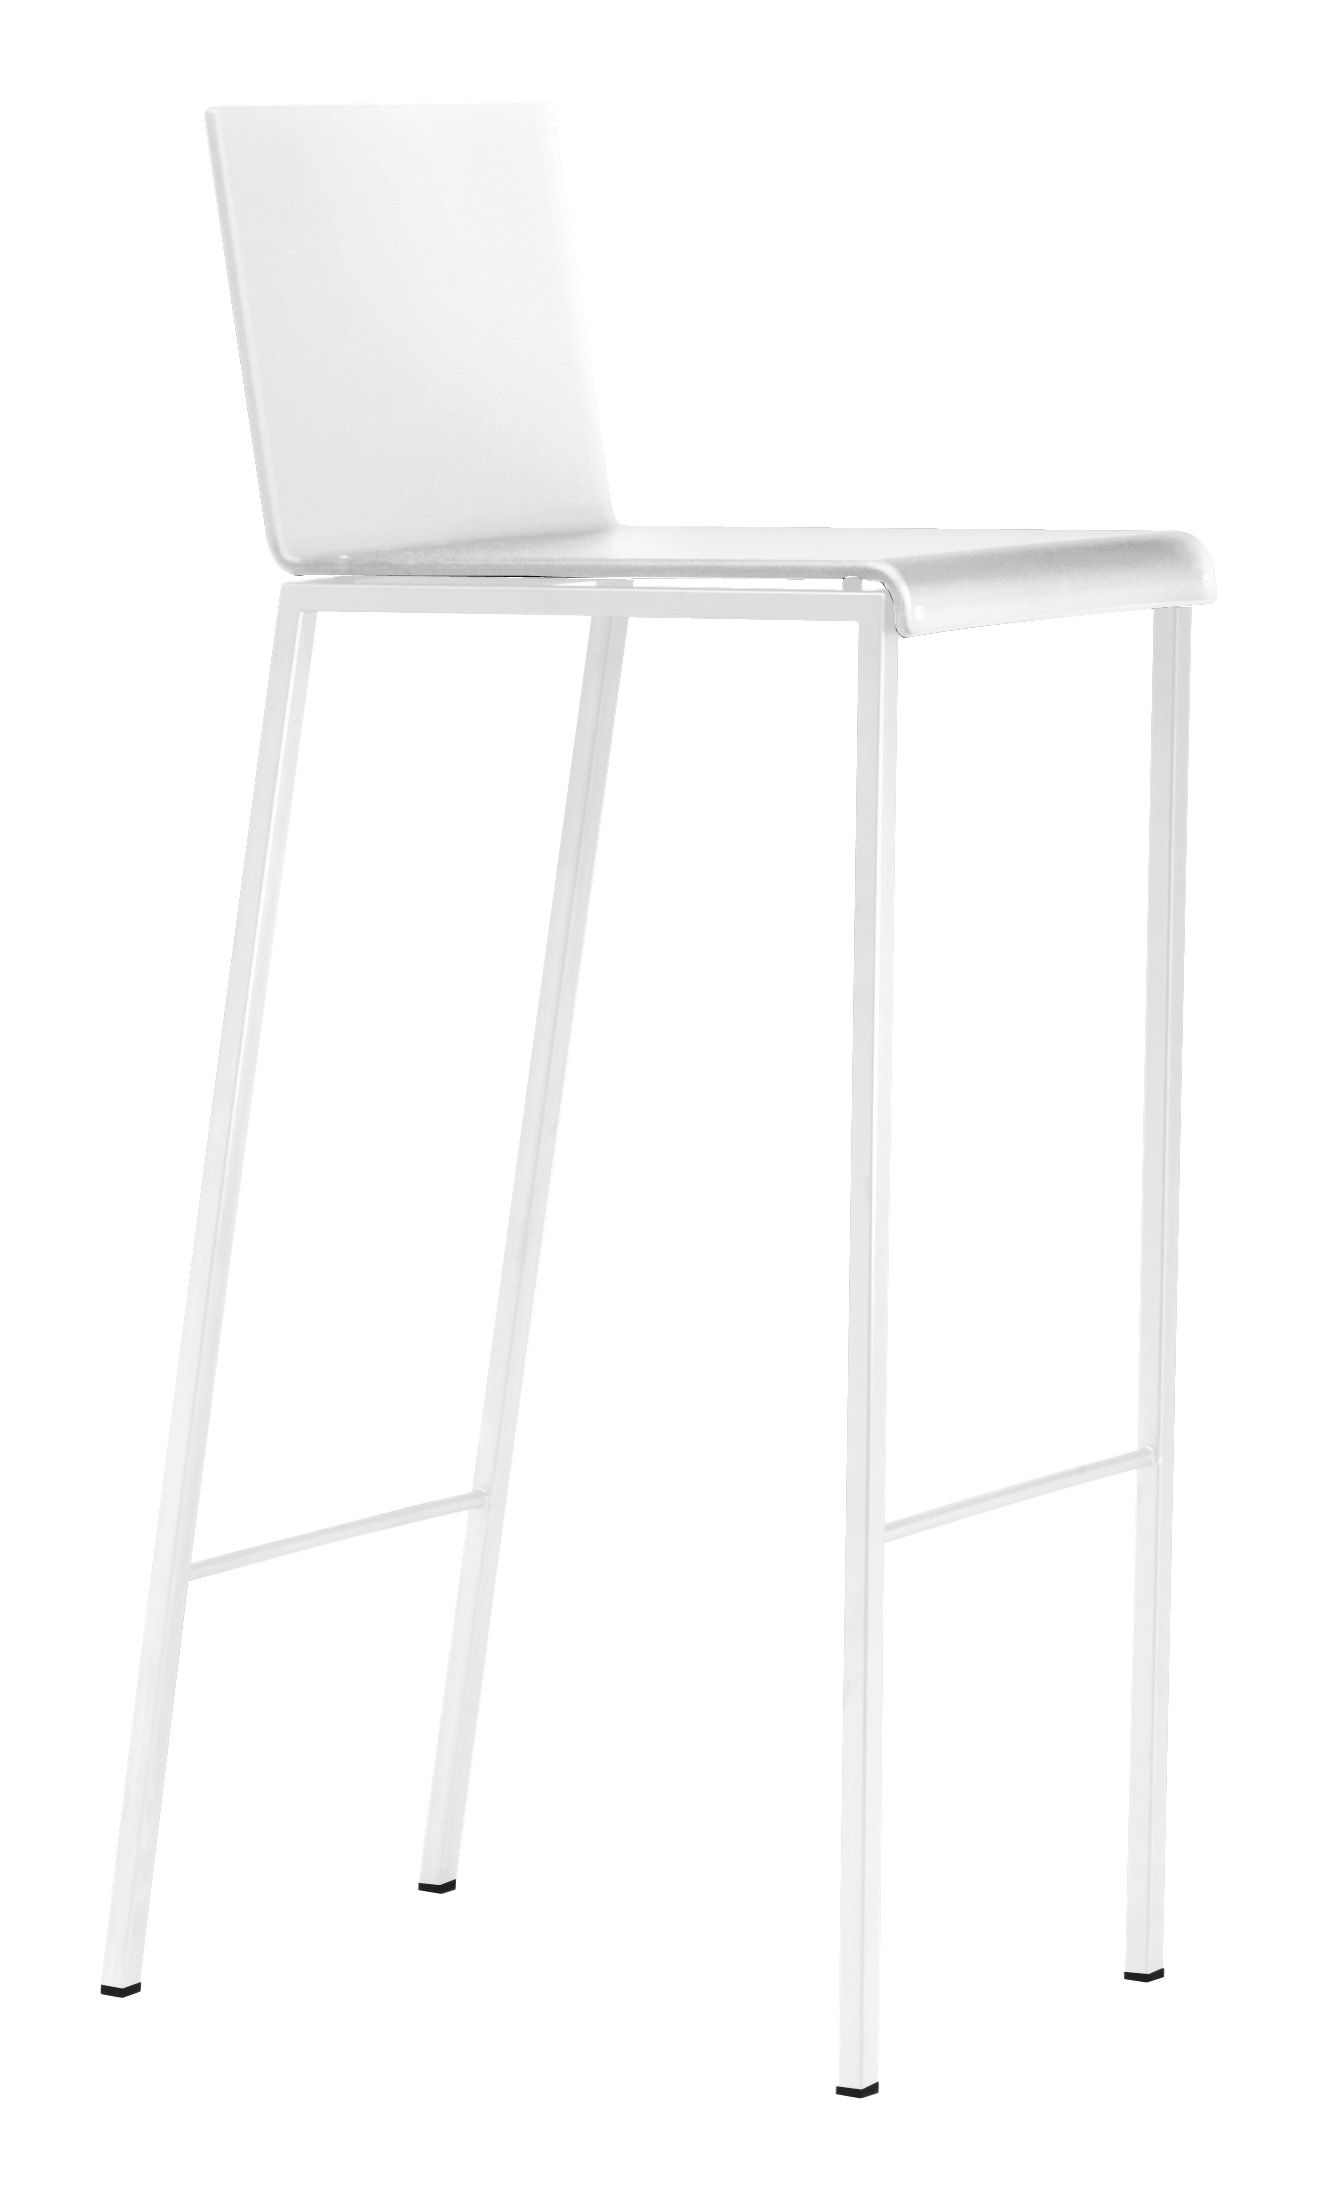 Möbel - Barhocker - Bianco Hochstuhl - Farbe matt - monochrom - Zeus - Sitz  opalweiß - Stuhlbeine weiß - Sitzhöhe 80 cm - Acrylharz, Stahl